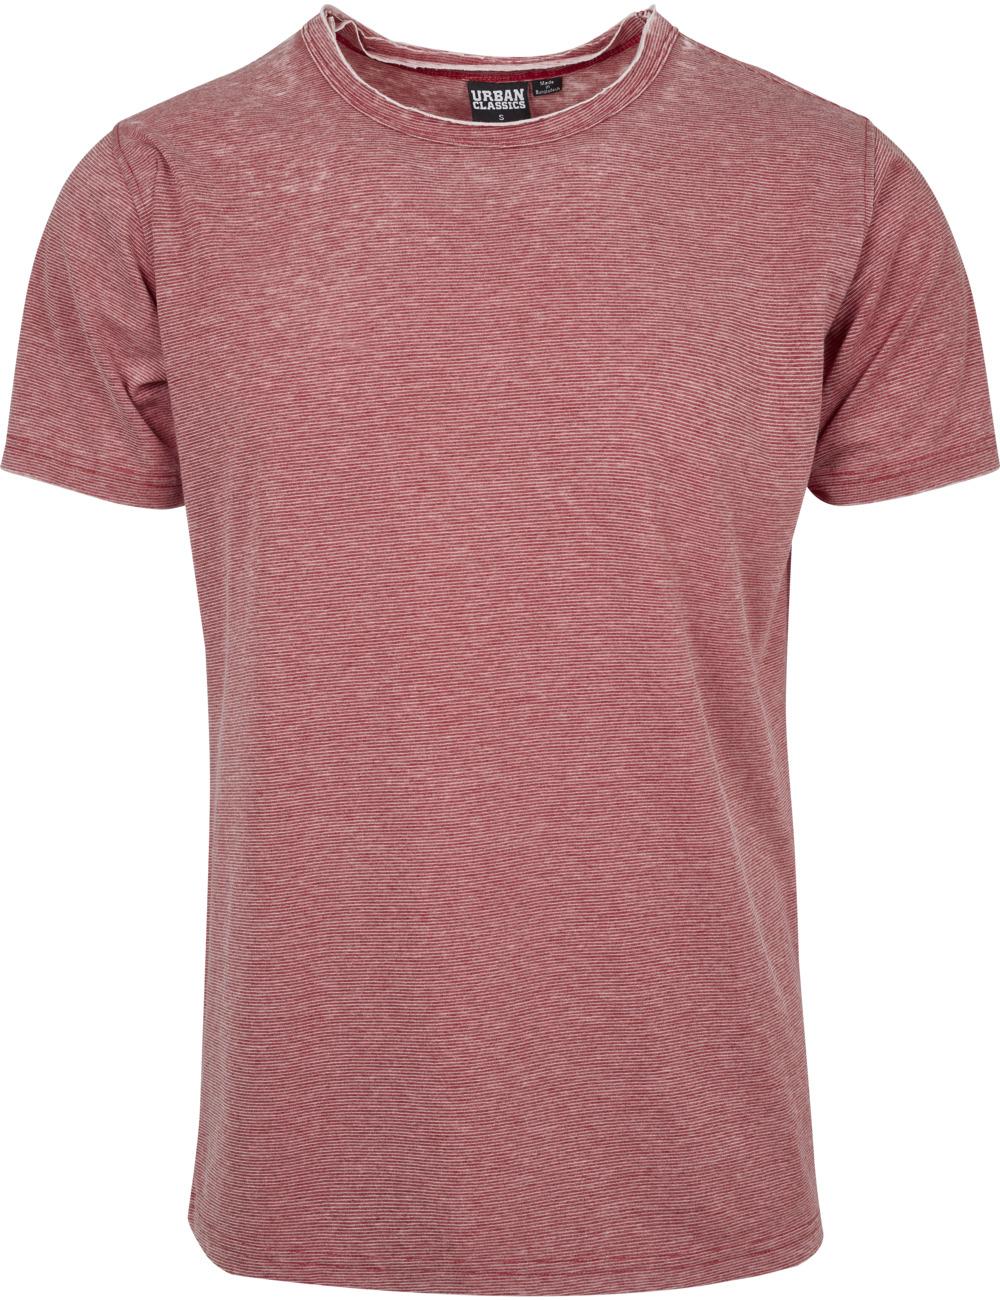 urban-classics-herren-t-shirt-stripe-burn-out-regular-fit